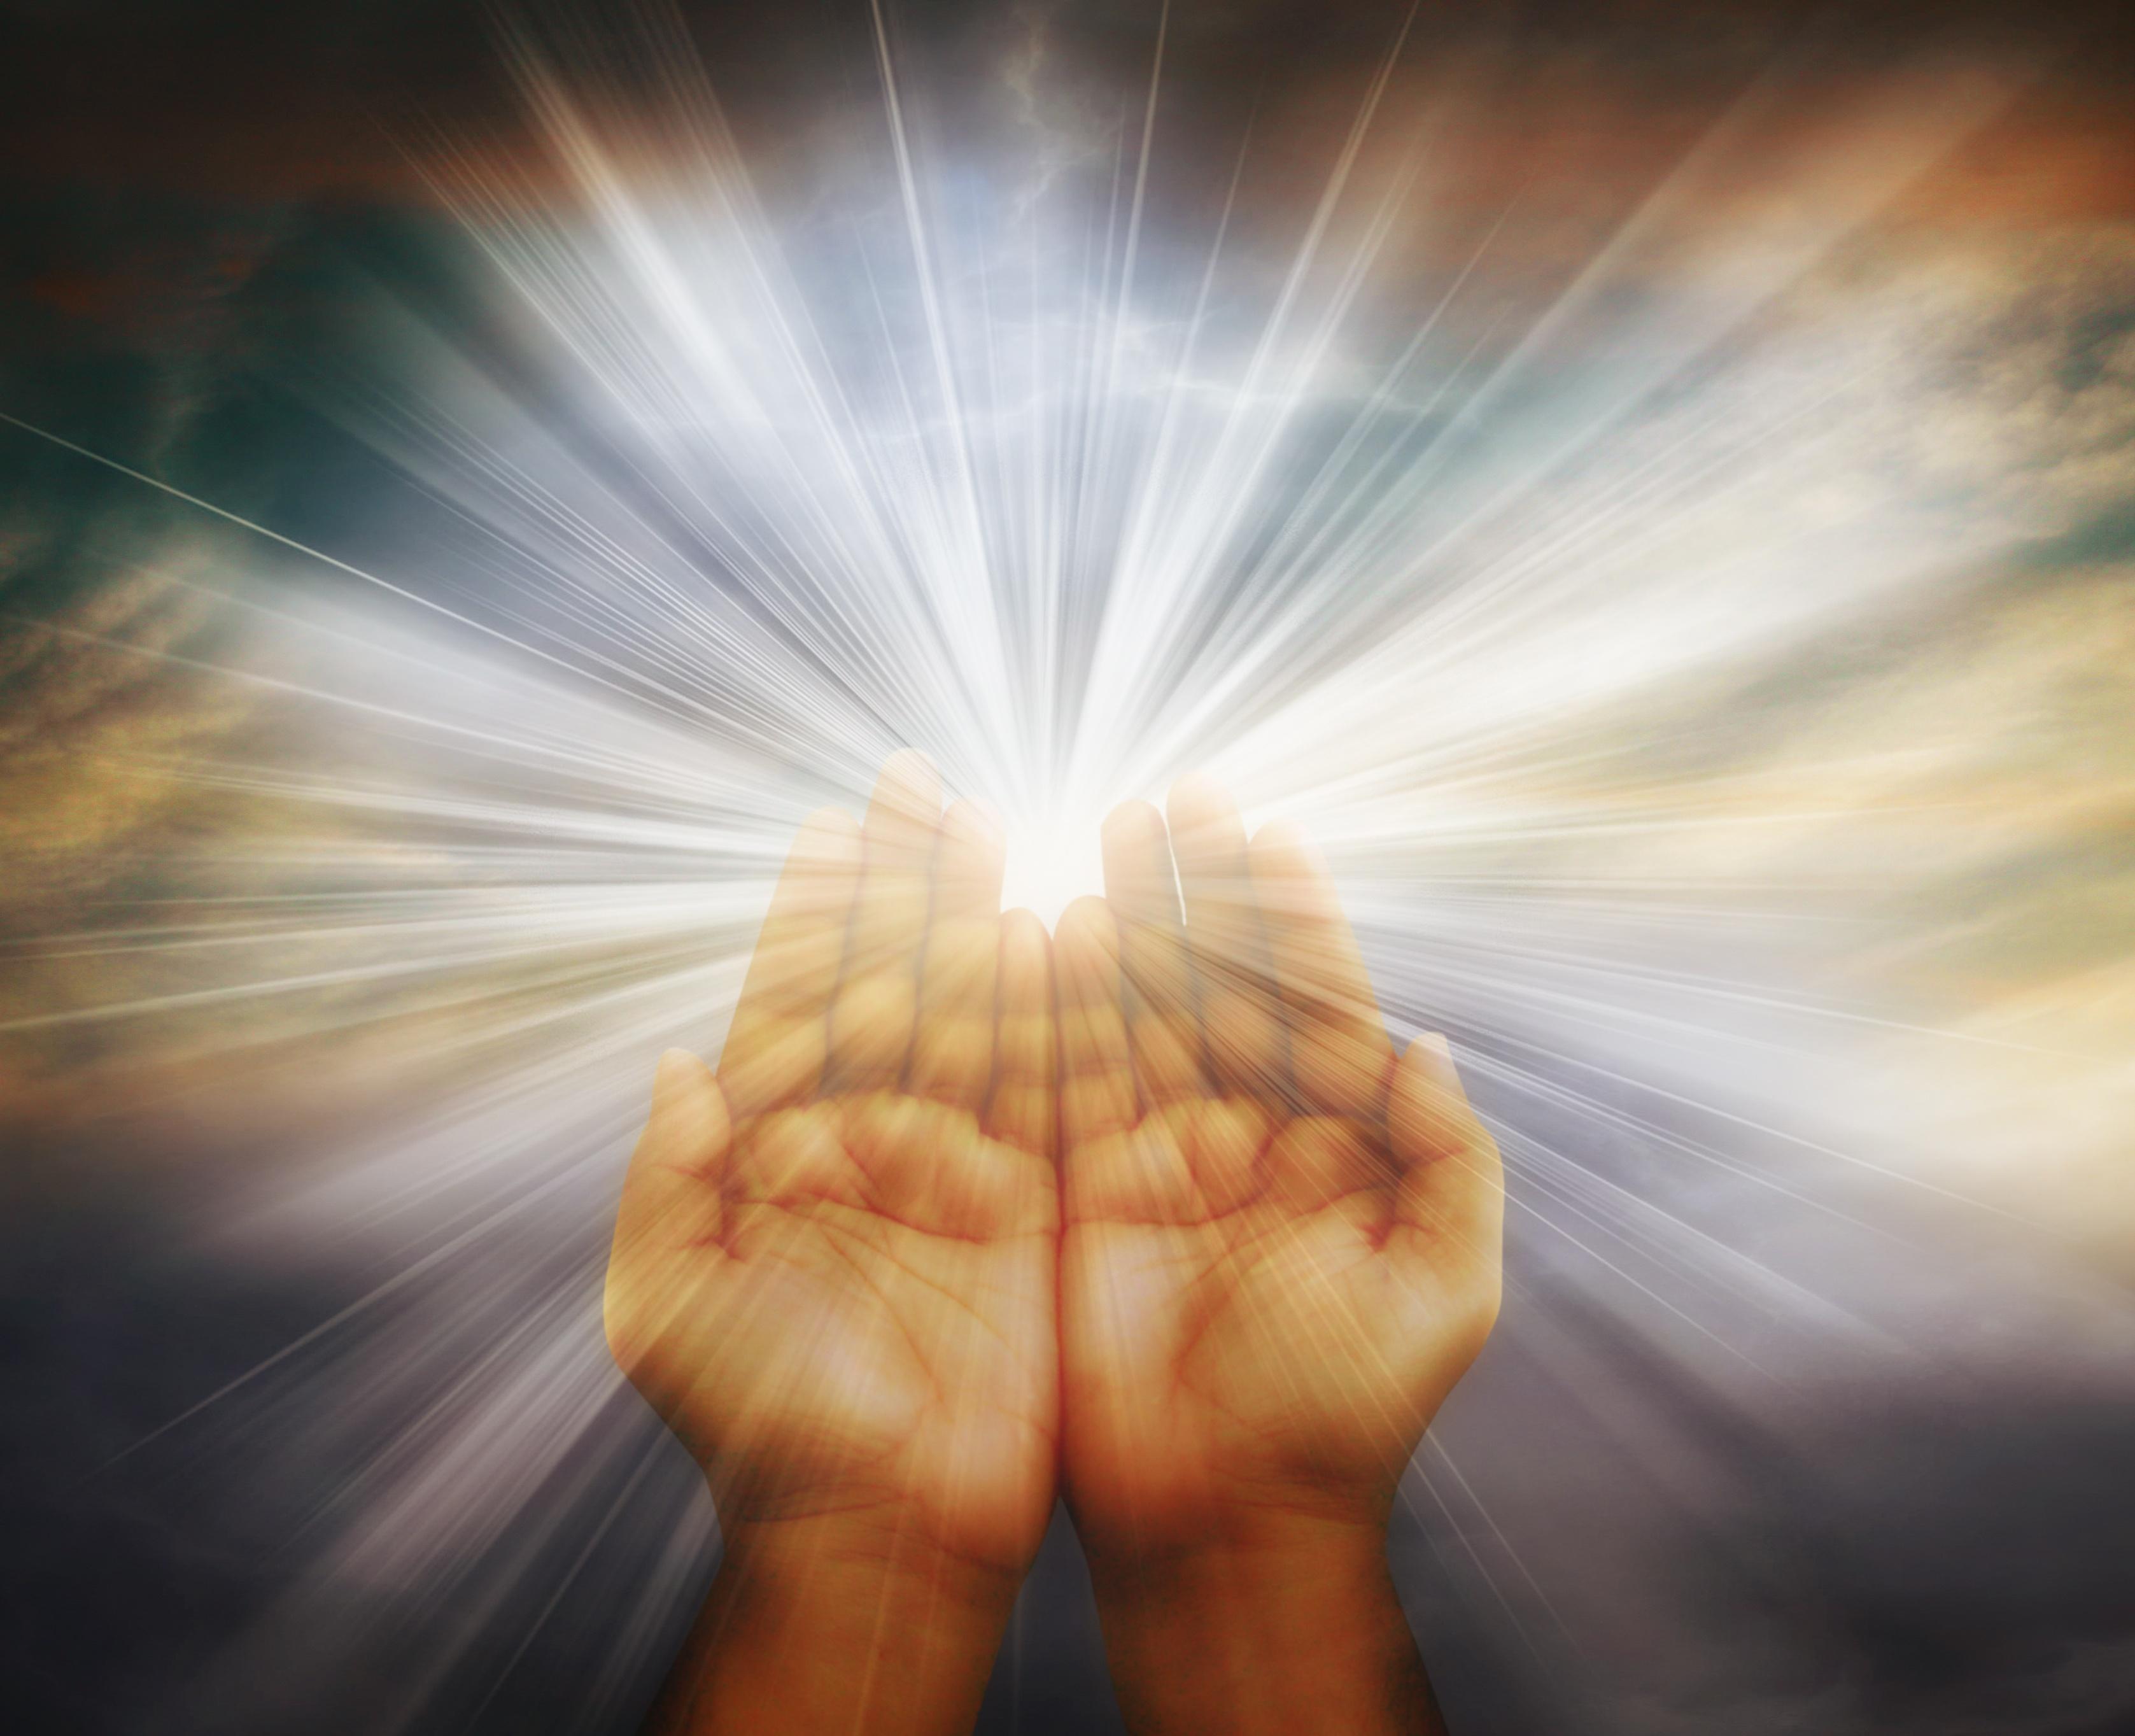 Healing clipart worship hand Free Cliparts Art Art Healing